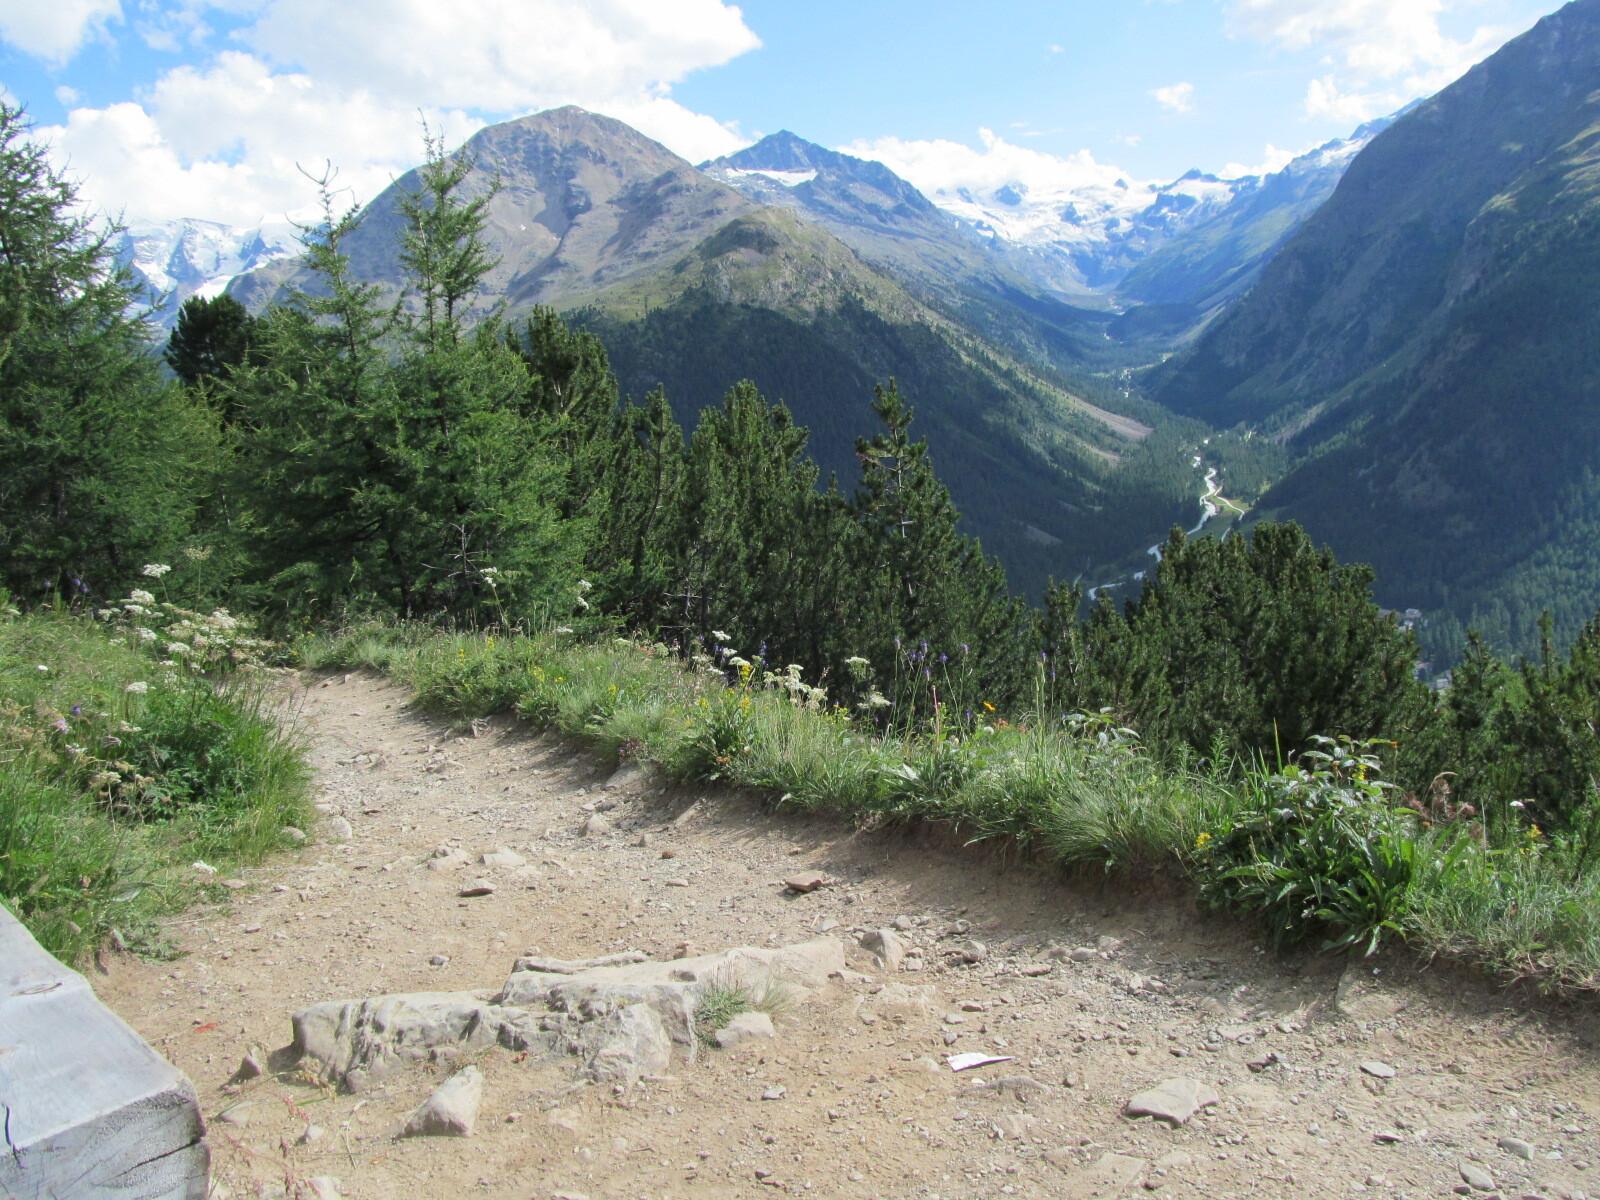 Sitzbänke Panoramaweg Muottas-Muragl - Alp Languard Slide 5